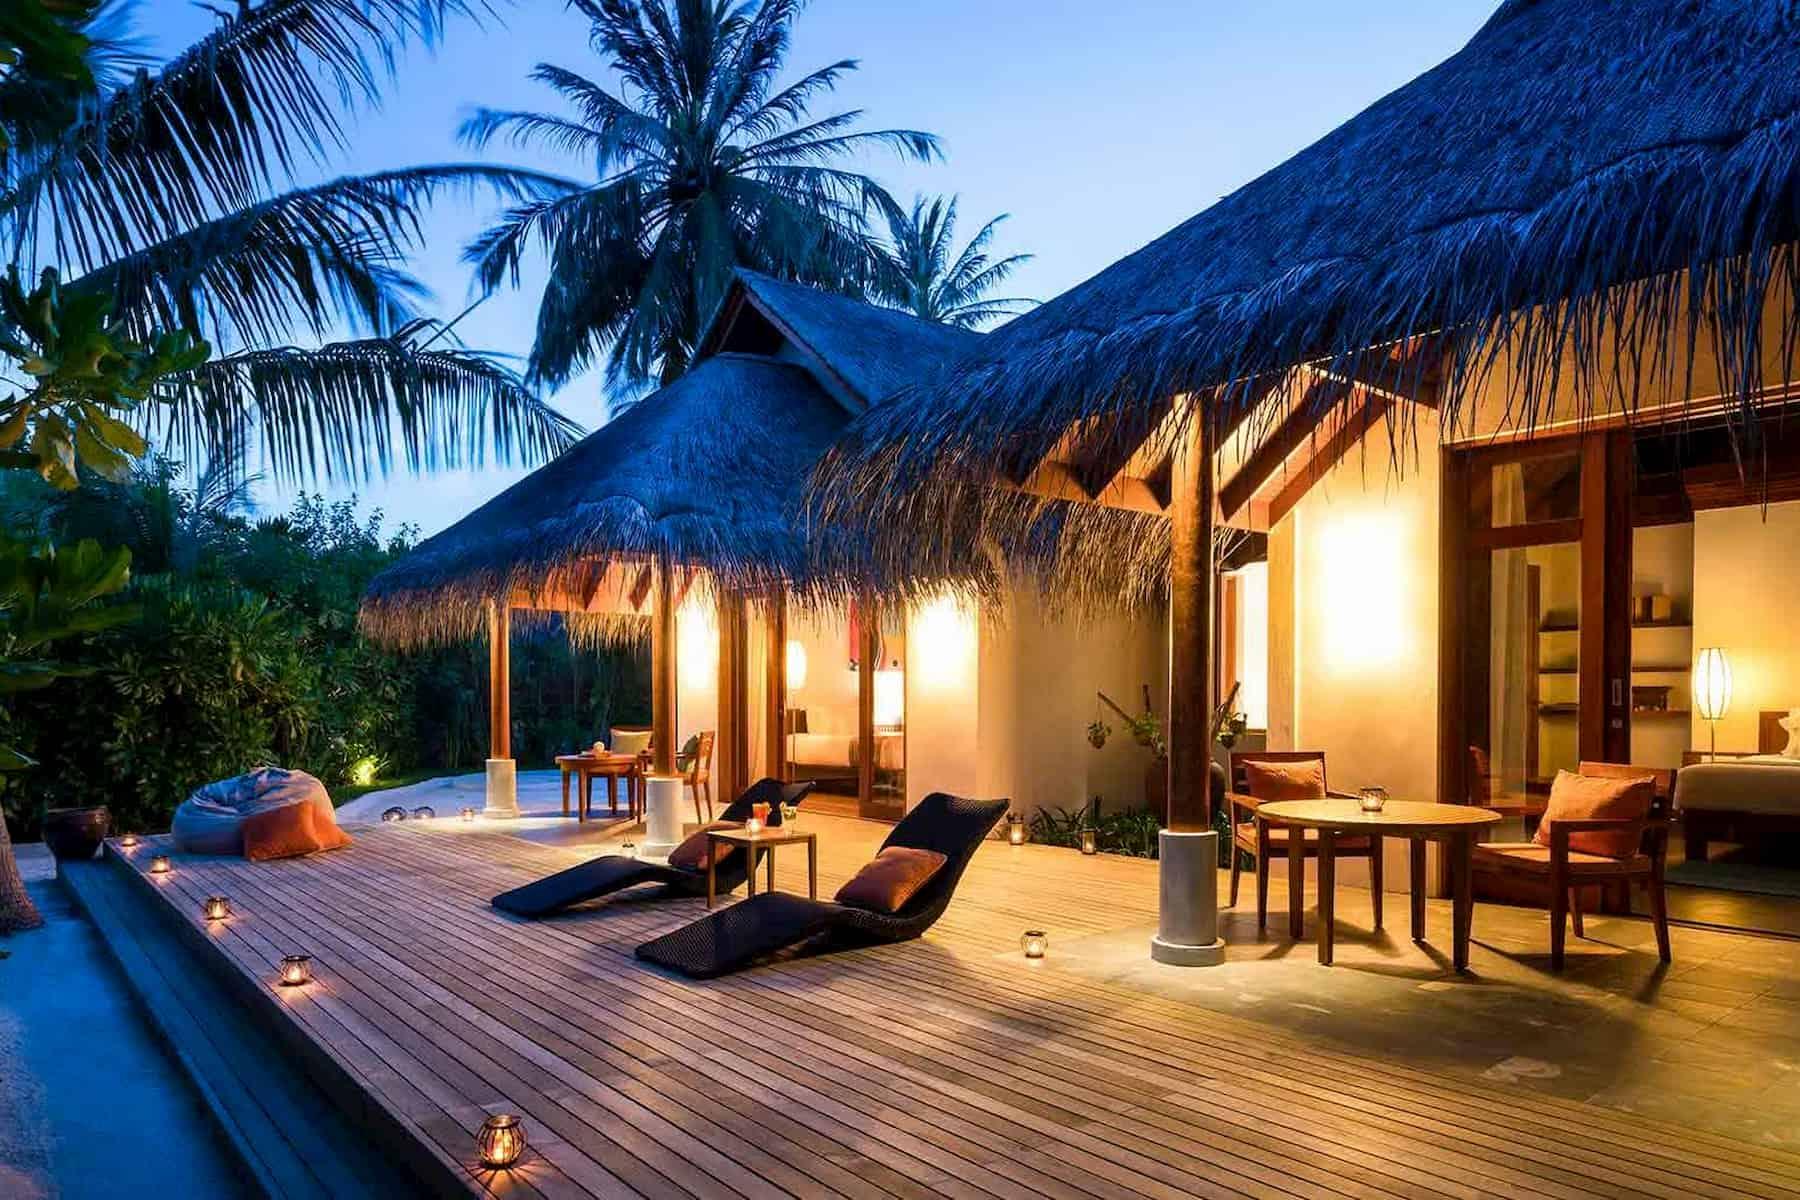 Anantara Dhigu resort Maldive two bedroom family villa